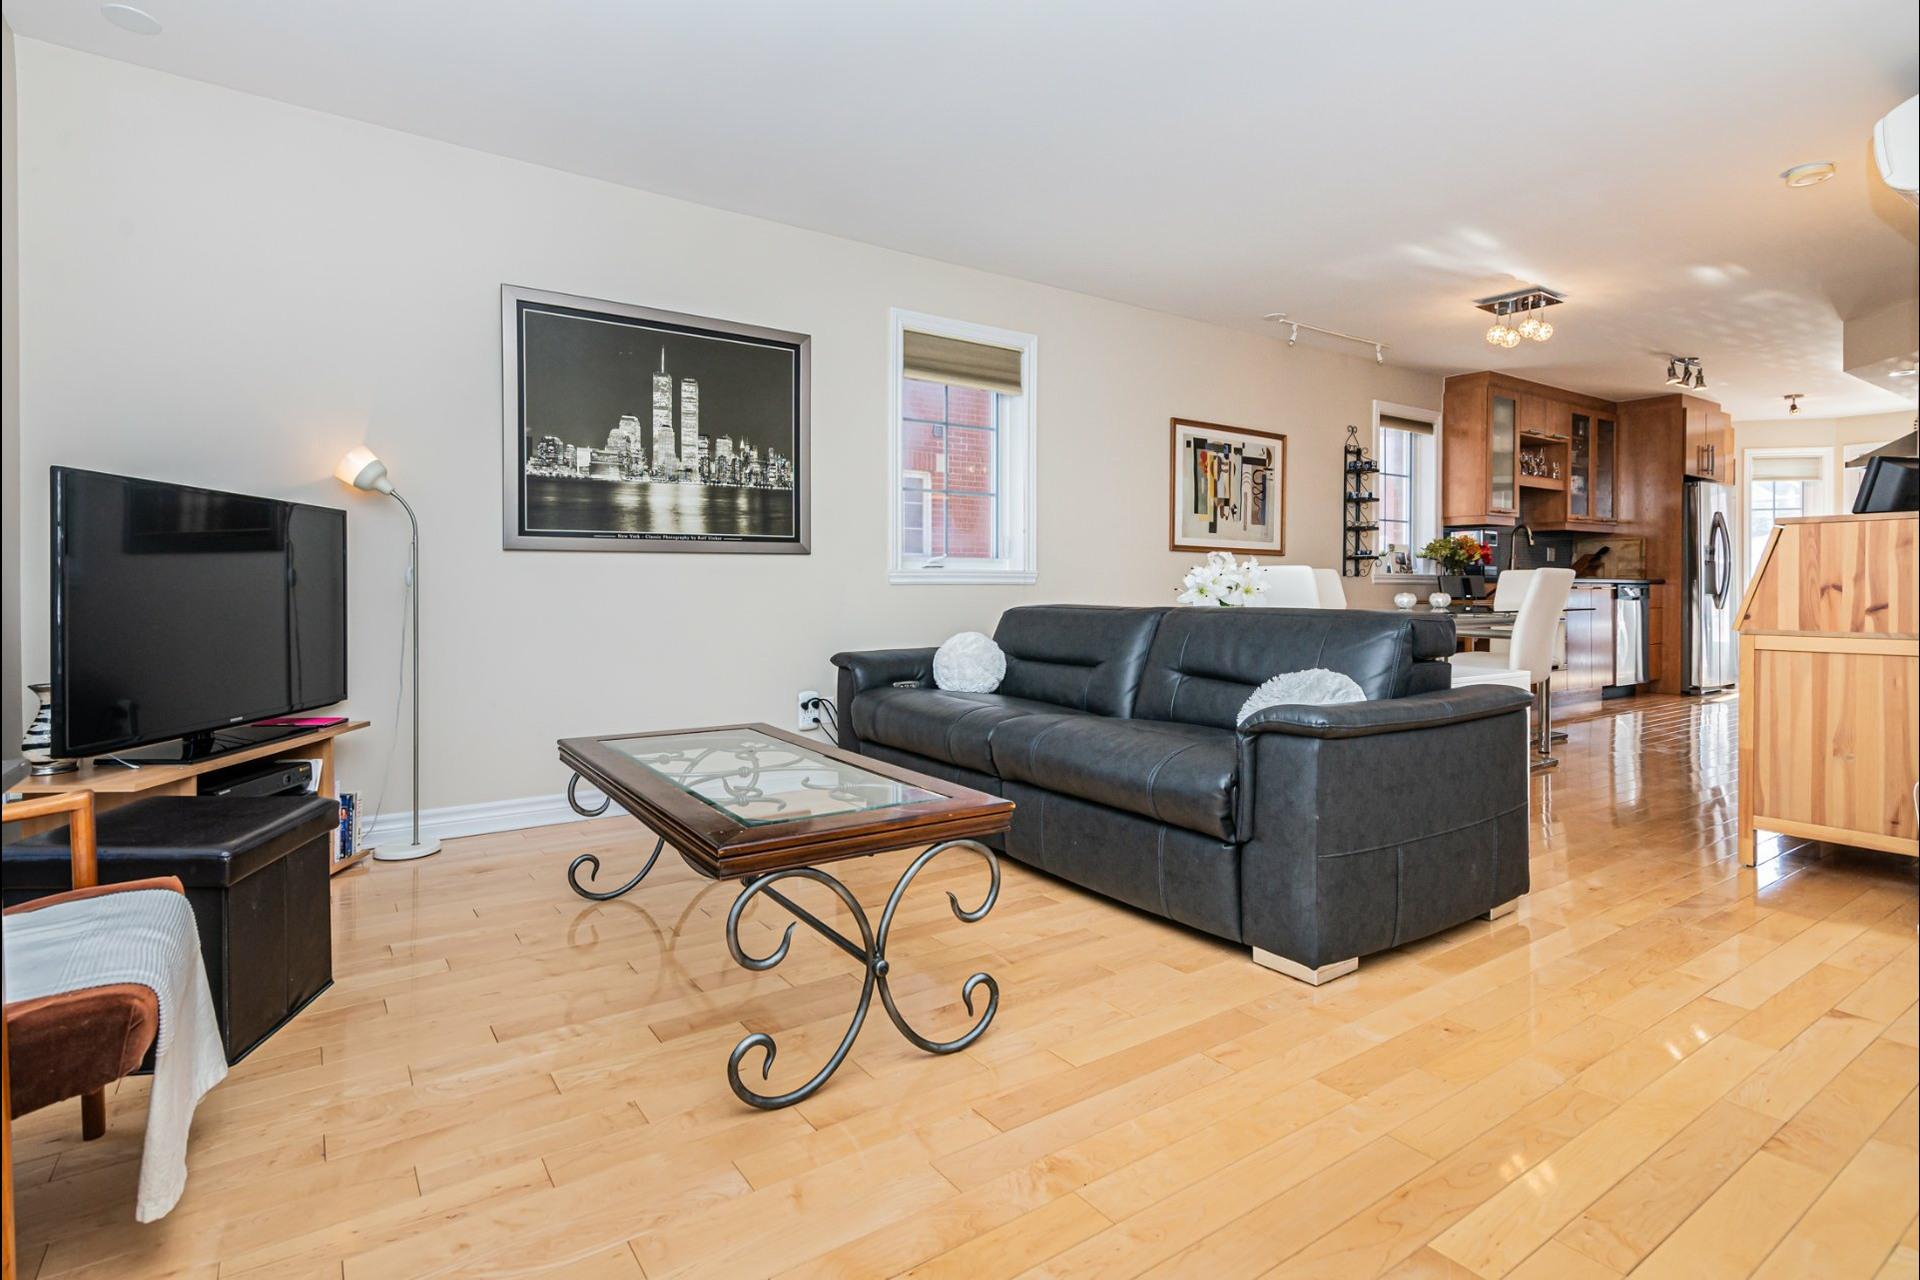 image 2 - Departamento En venta Saint-Laurent Montréal  - 4 habitaciones